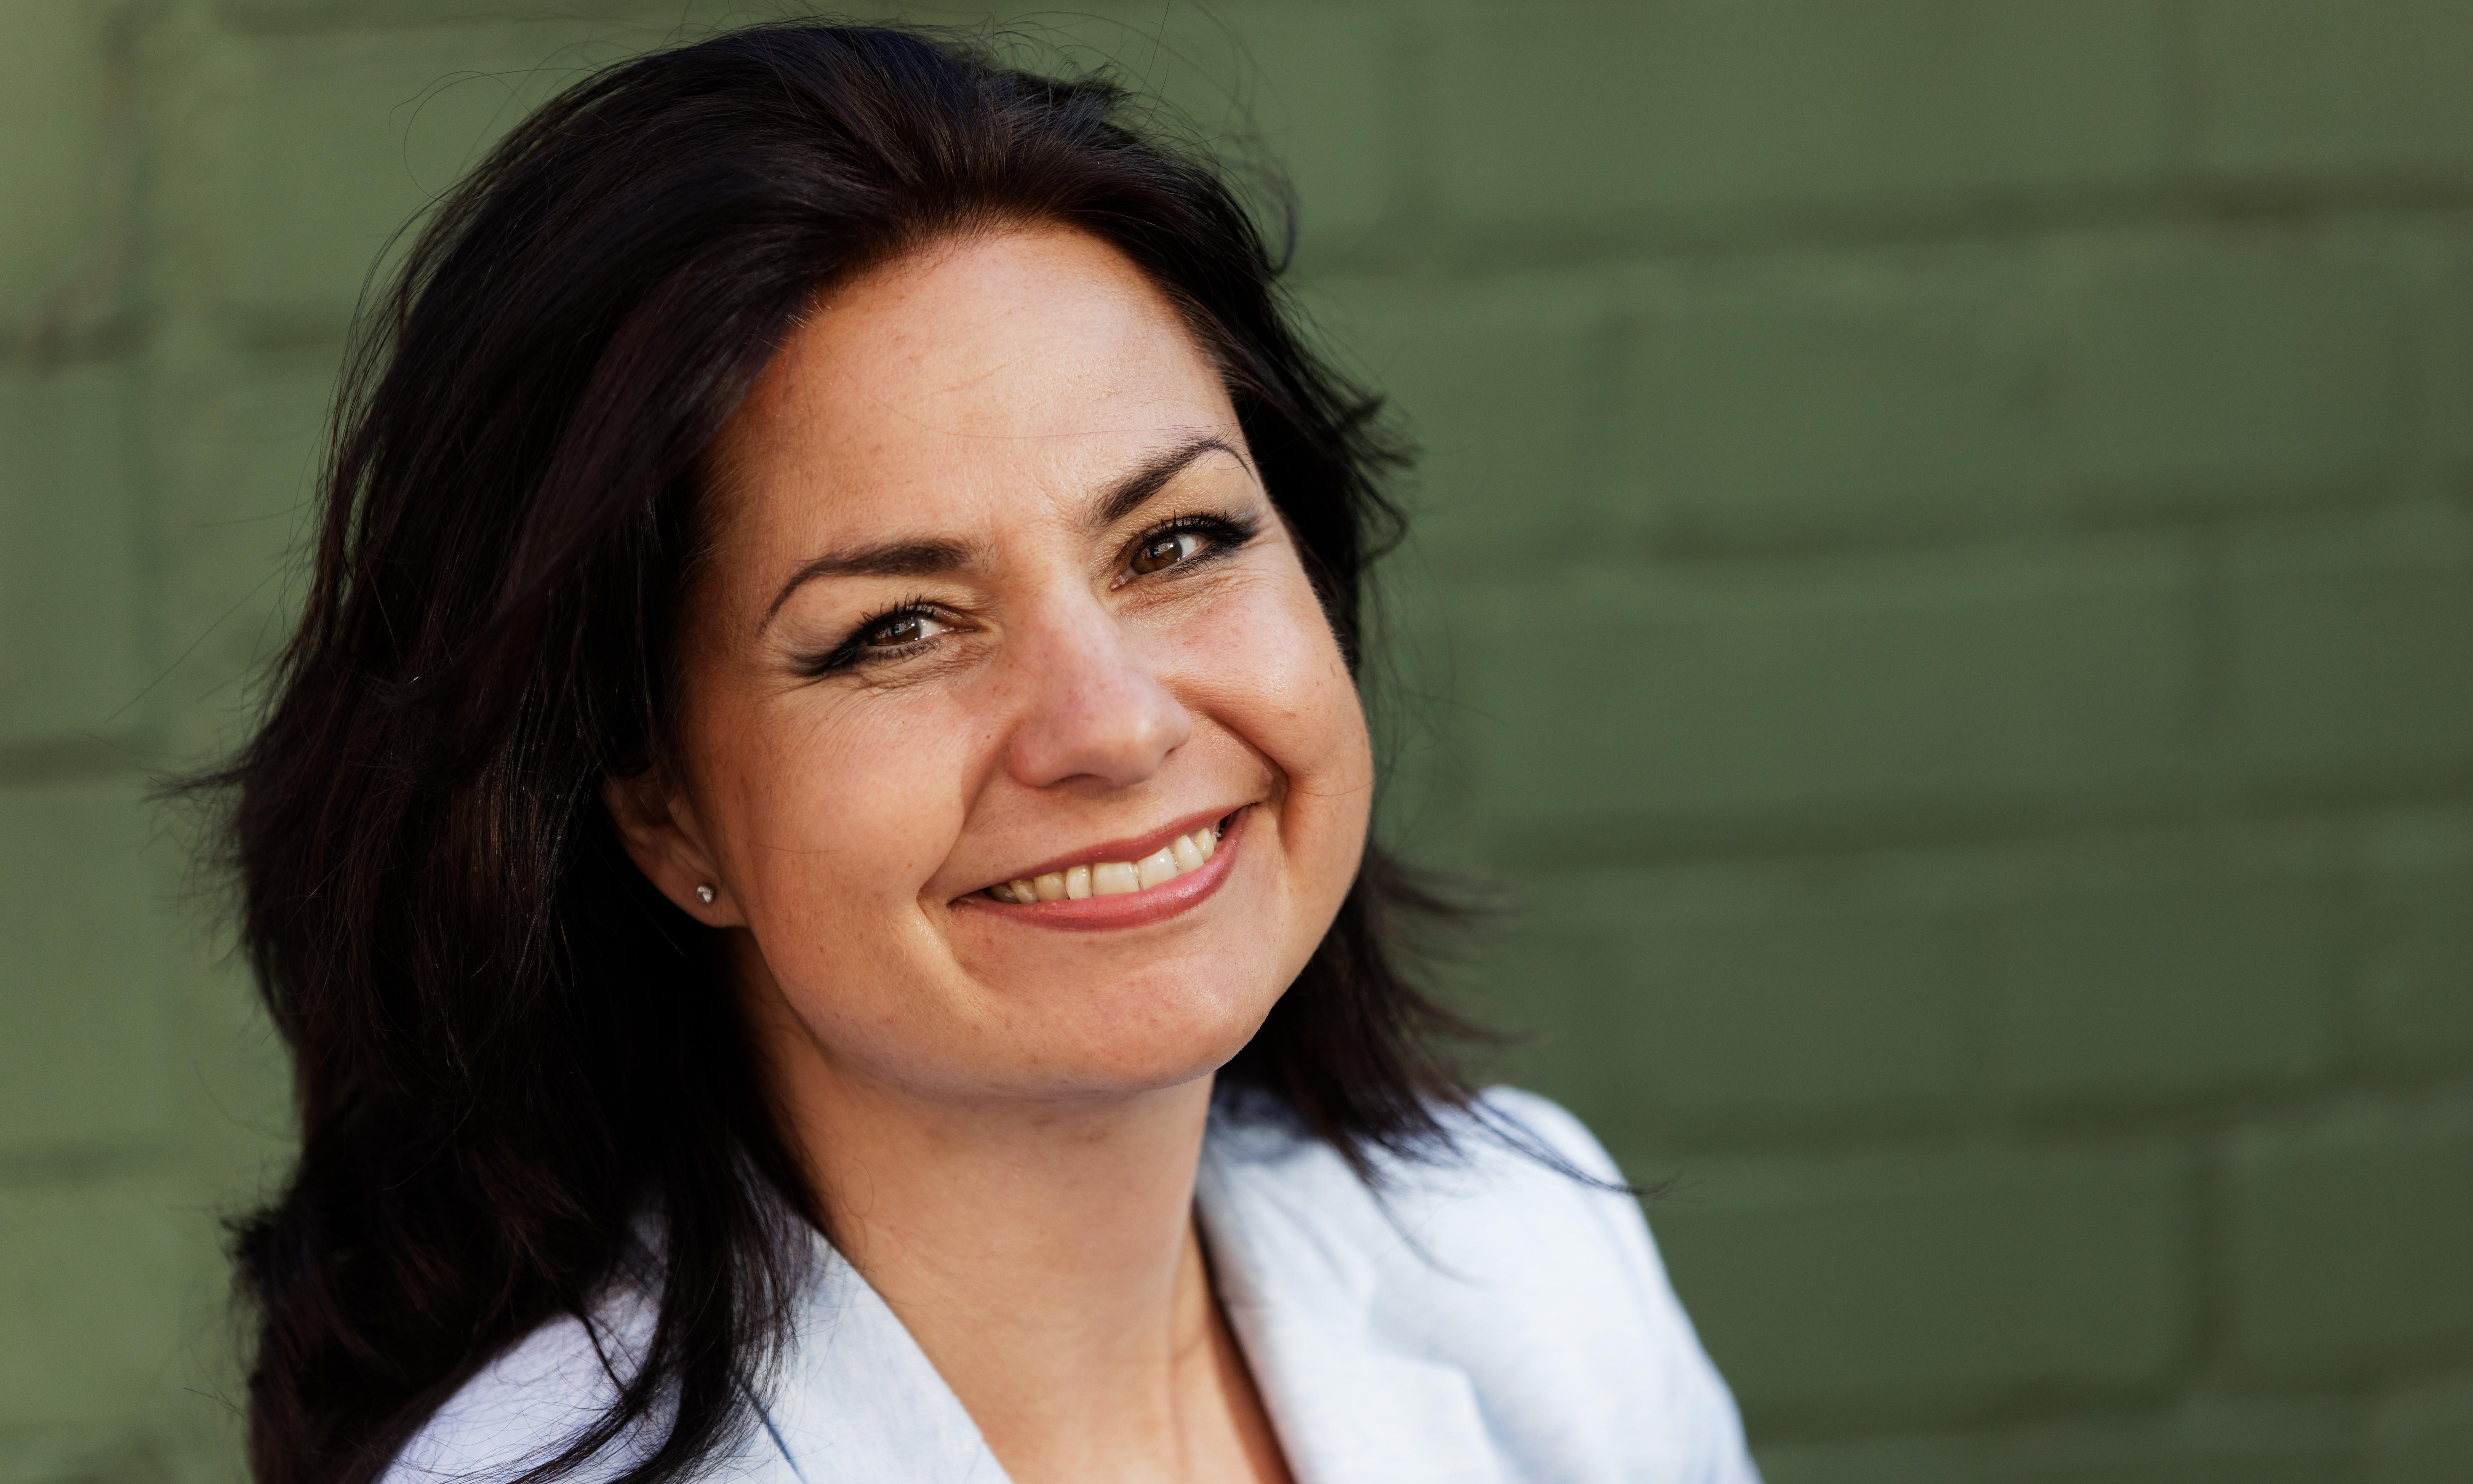 Former Tory MP Heidi Allen joins Liberal Democrats